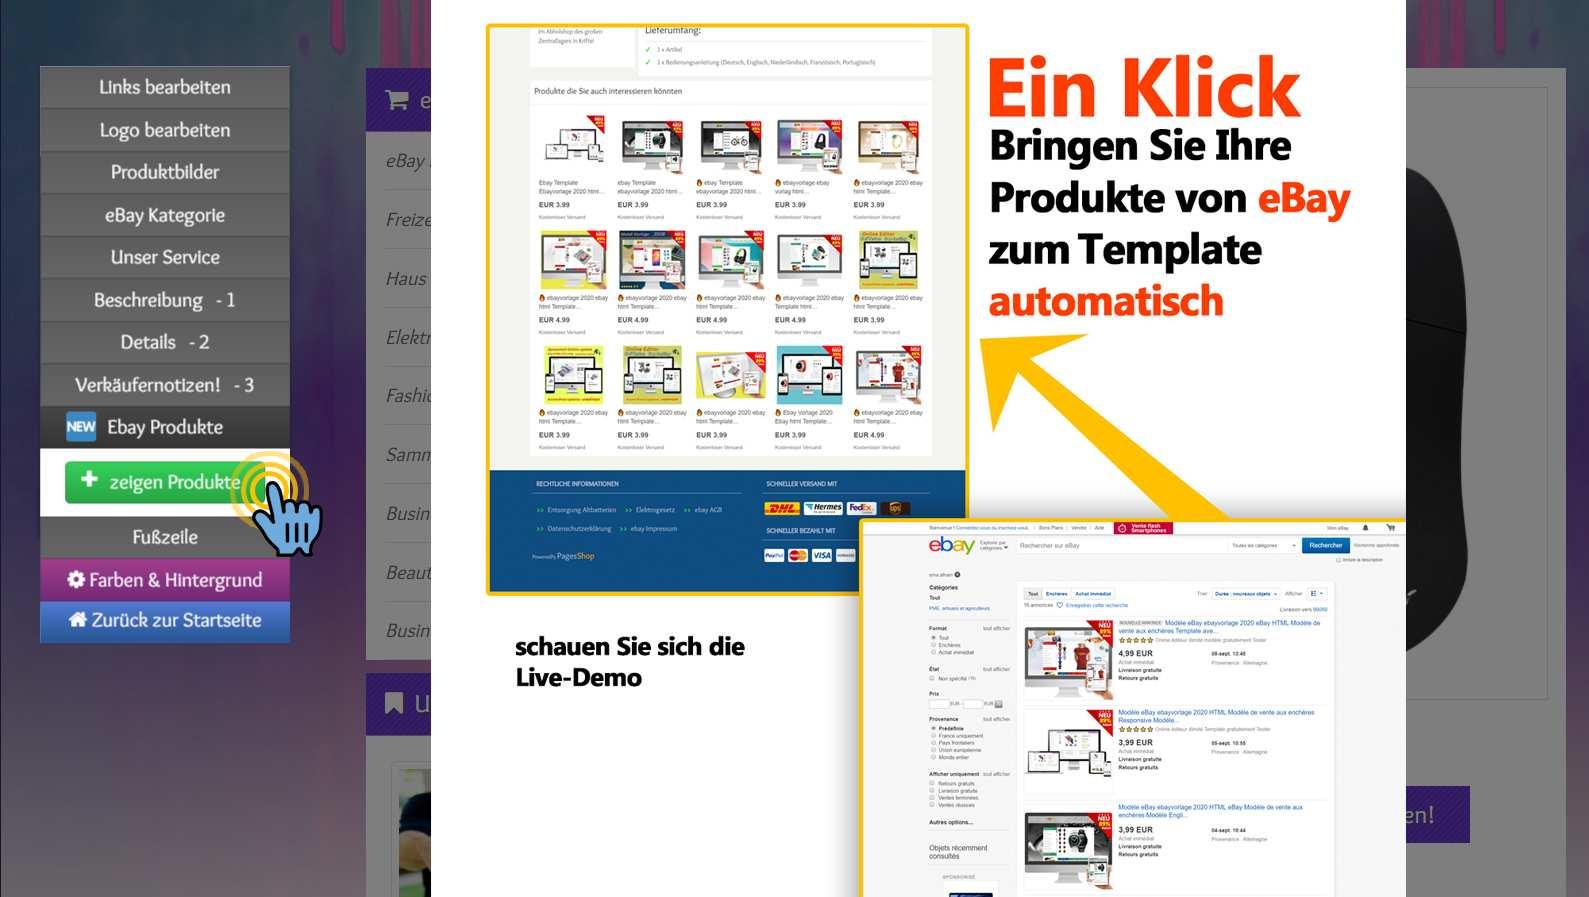 Free Ebay Templates Kostenlos Ebay Template Pagesshop